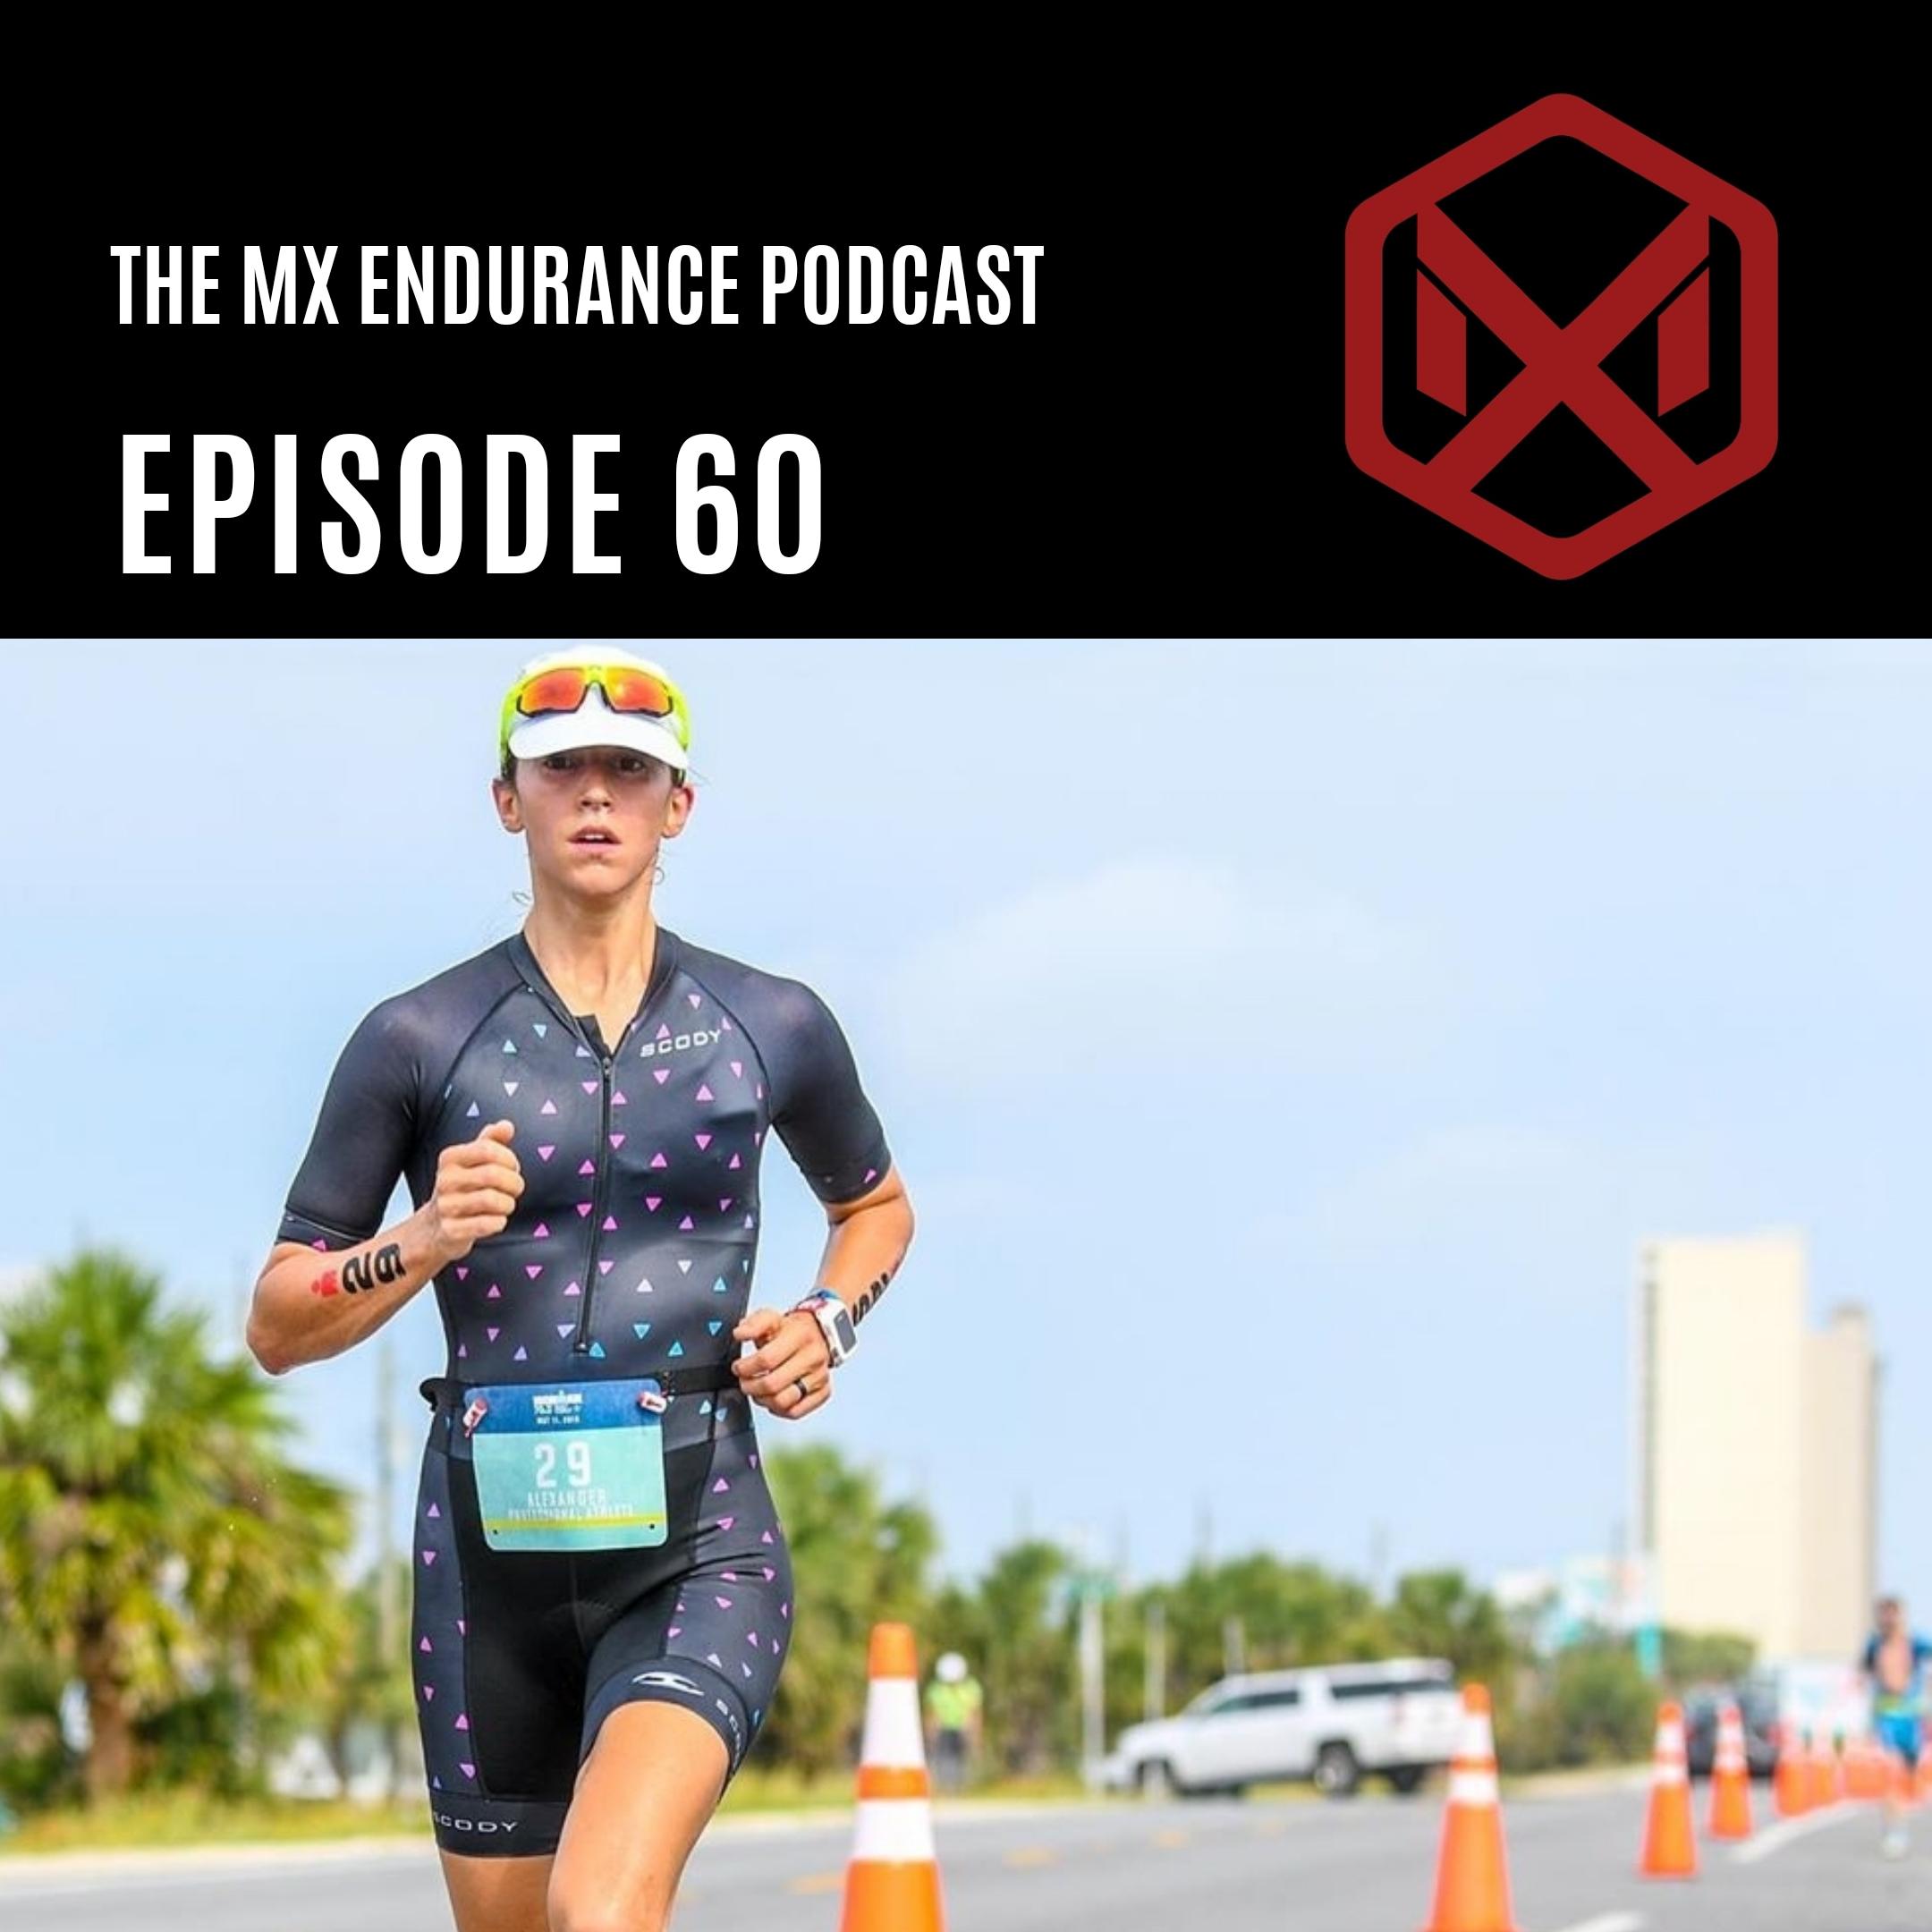 #60 - Professional Triathlete Sarah Alexander